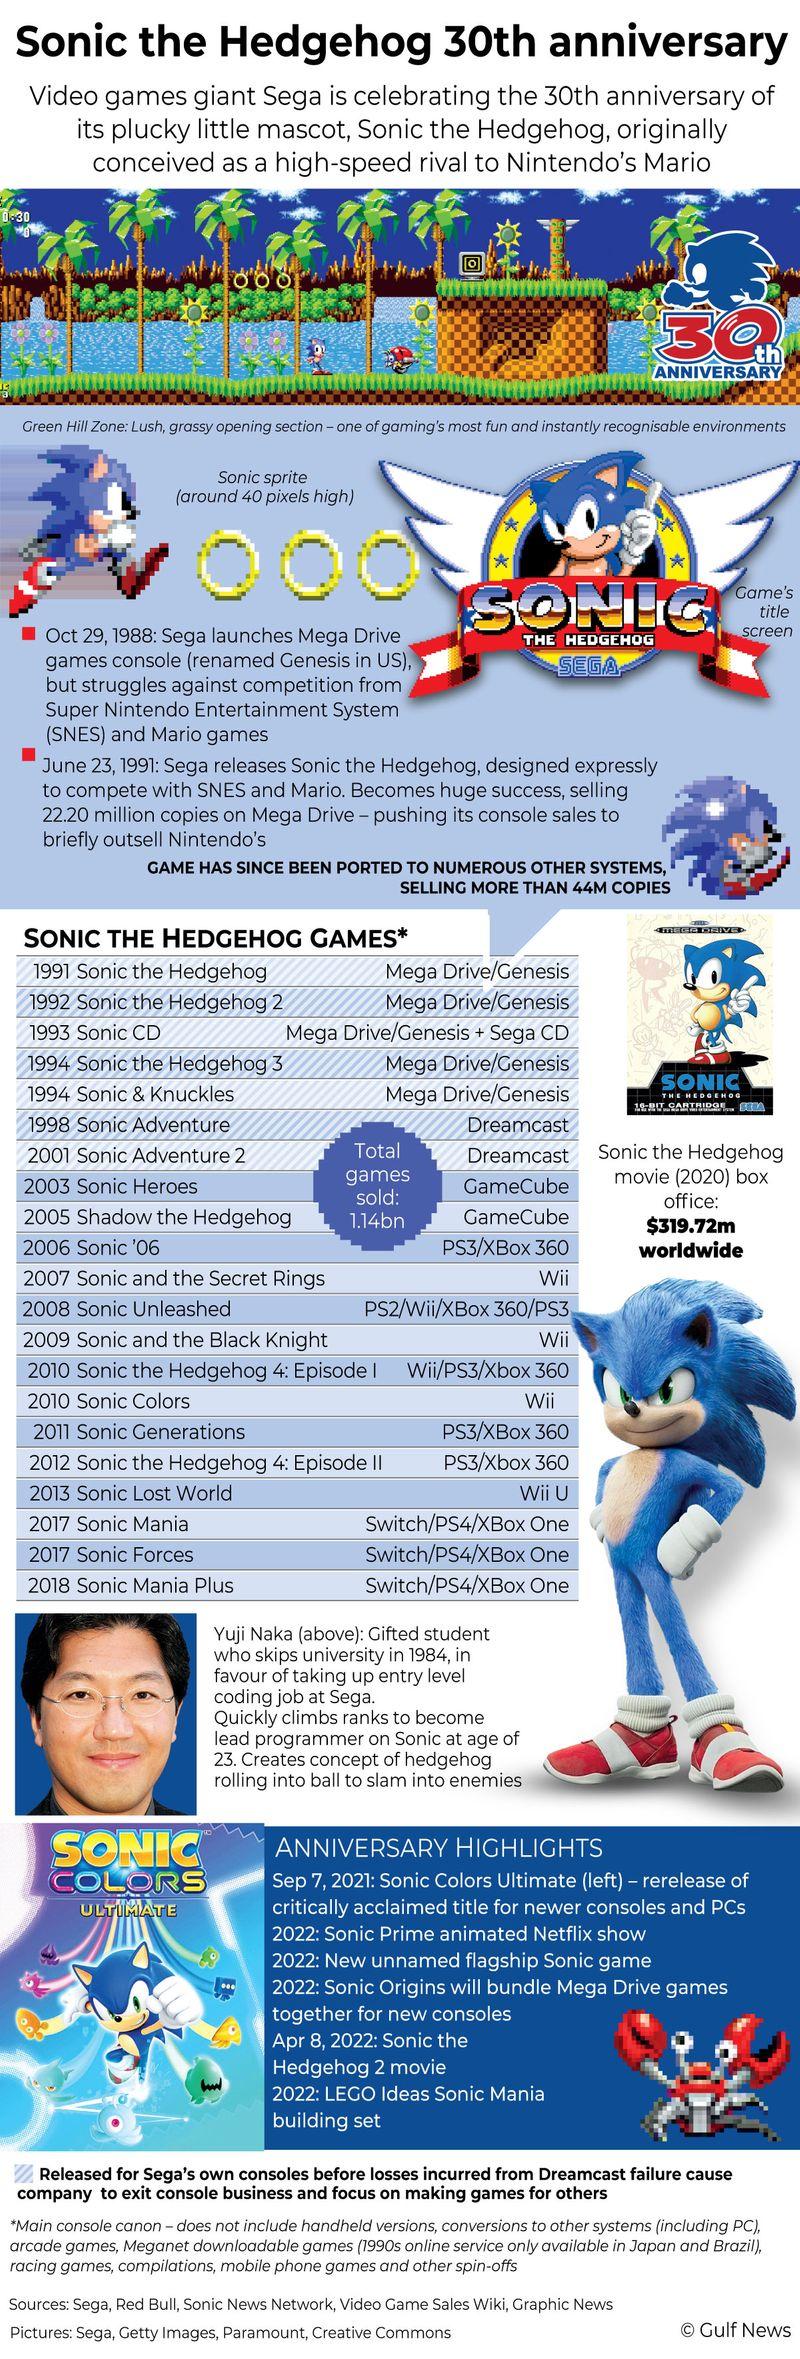 Infographics: Sonic the Hedgehog 30th anniversary